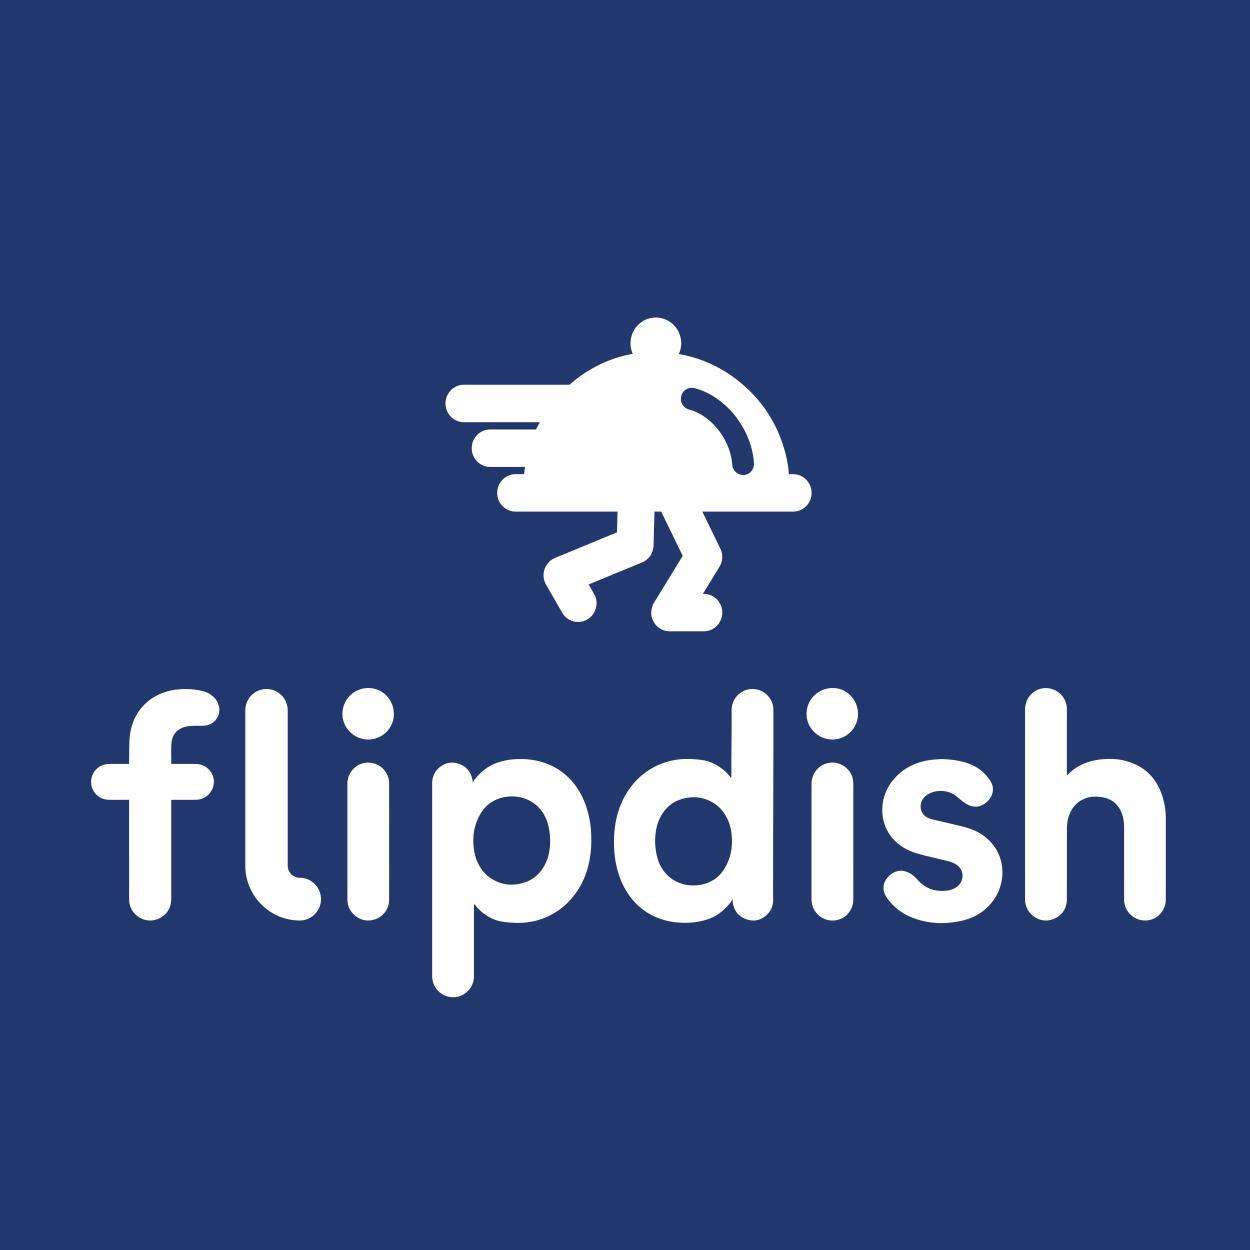 https://assets.lightspeedhq.com/img/2018/10/227a4997-flipdish-logo.jpg